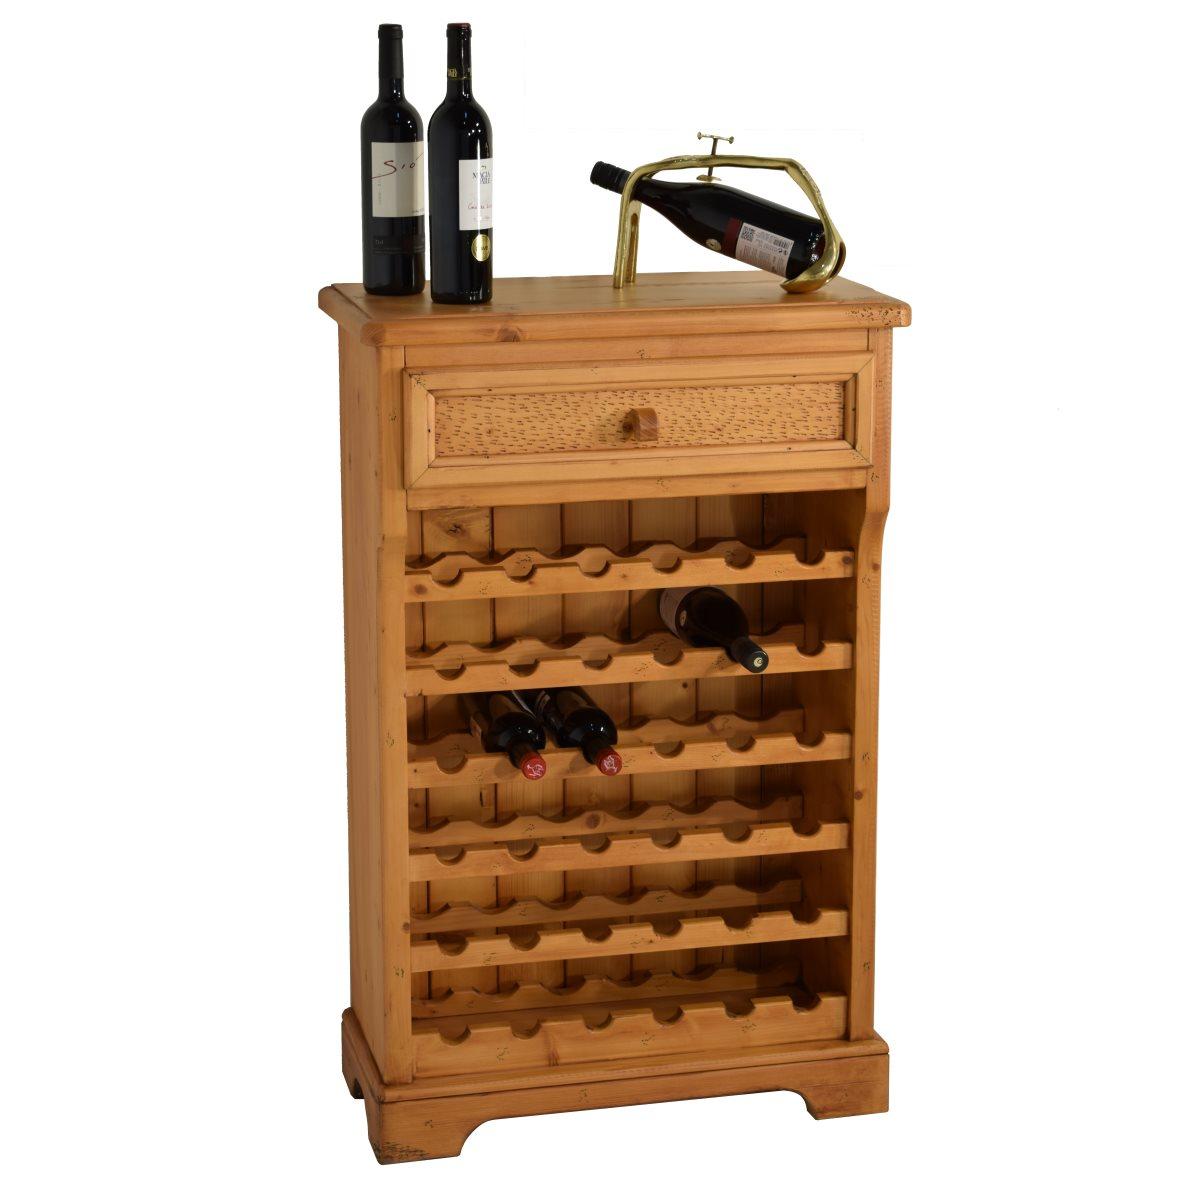 Botellero R Stico De Madera Ecor Stico Venta De Muebles # Muebles Botelleros